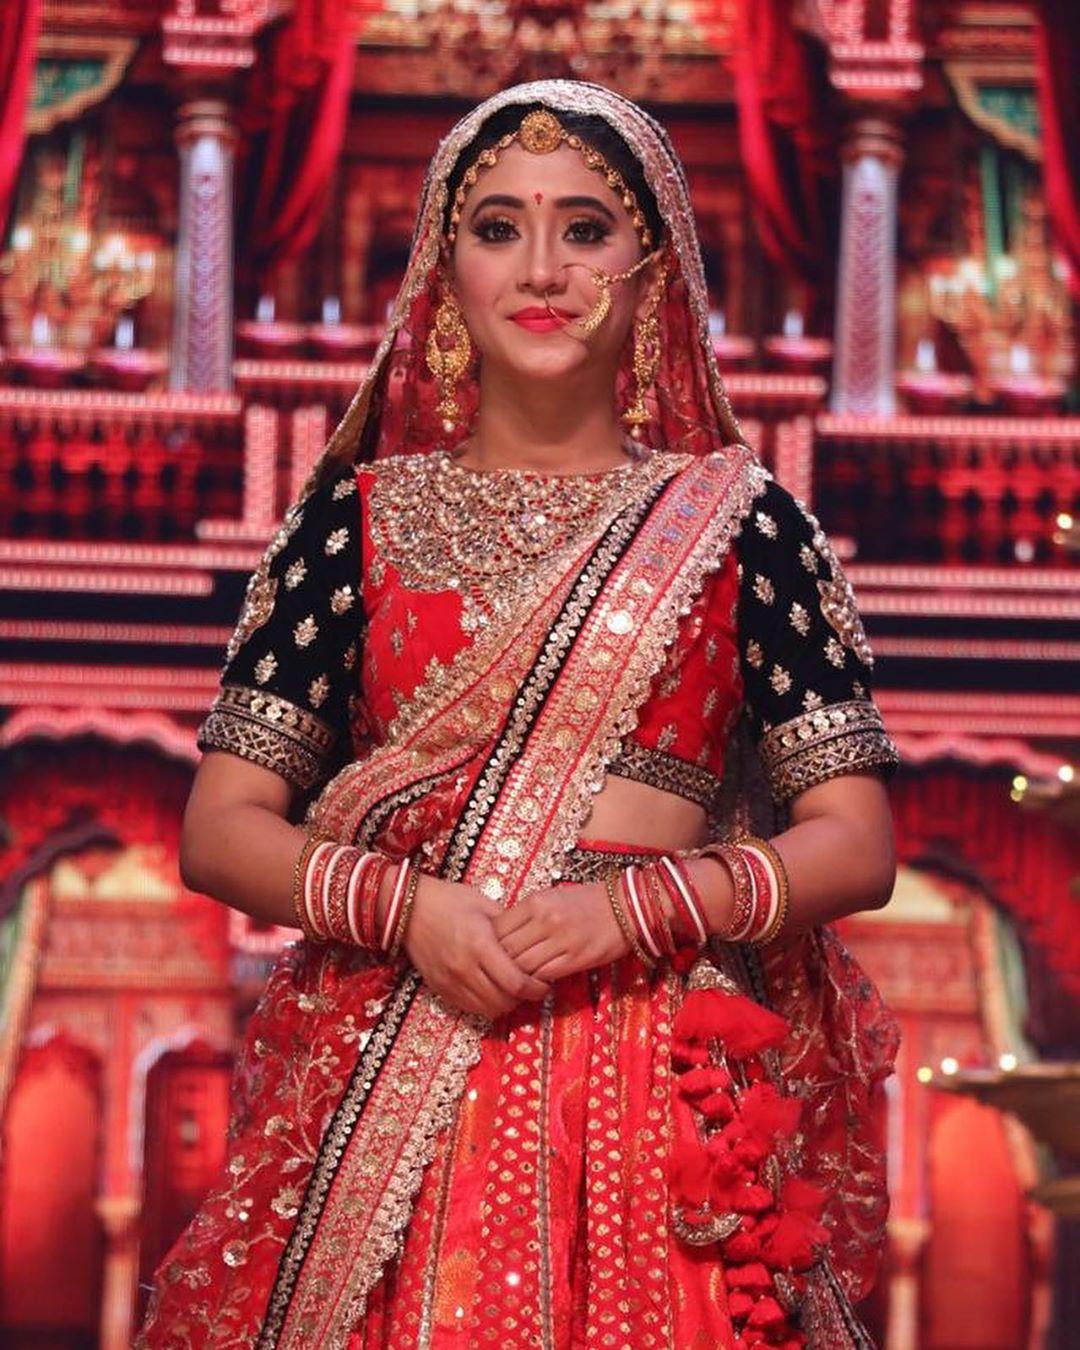 Maroon and pink formal wear, sari, jewellery